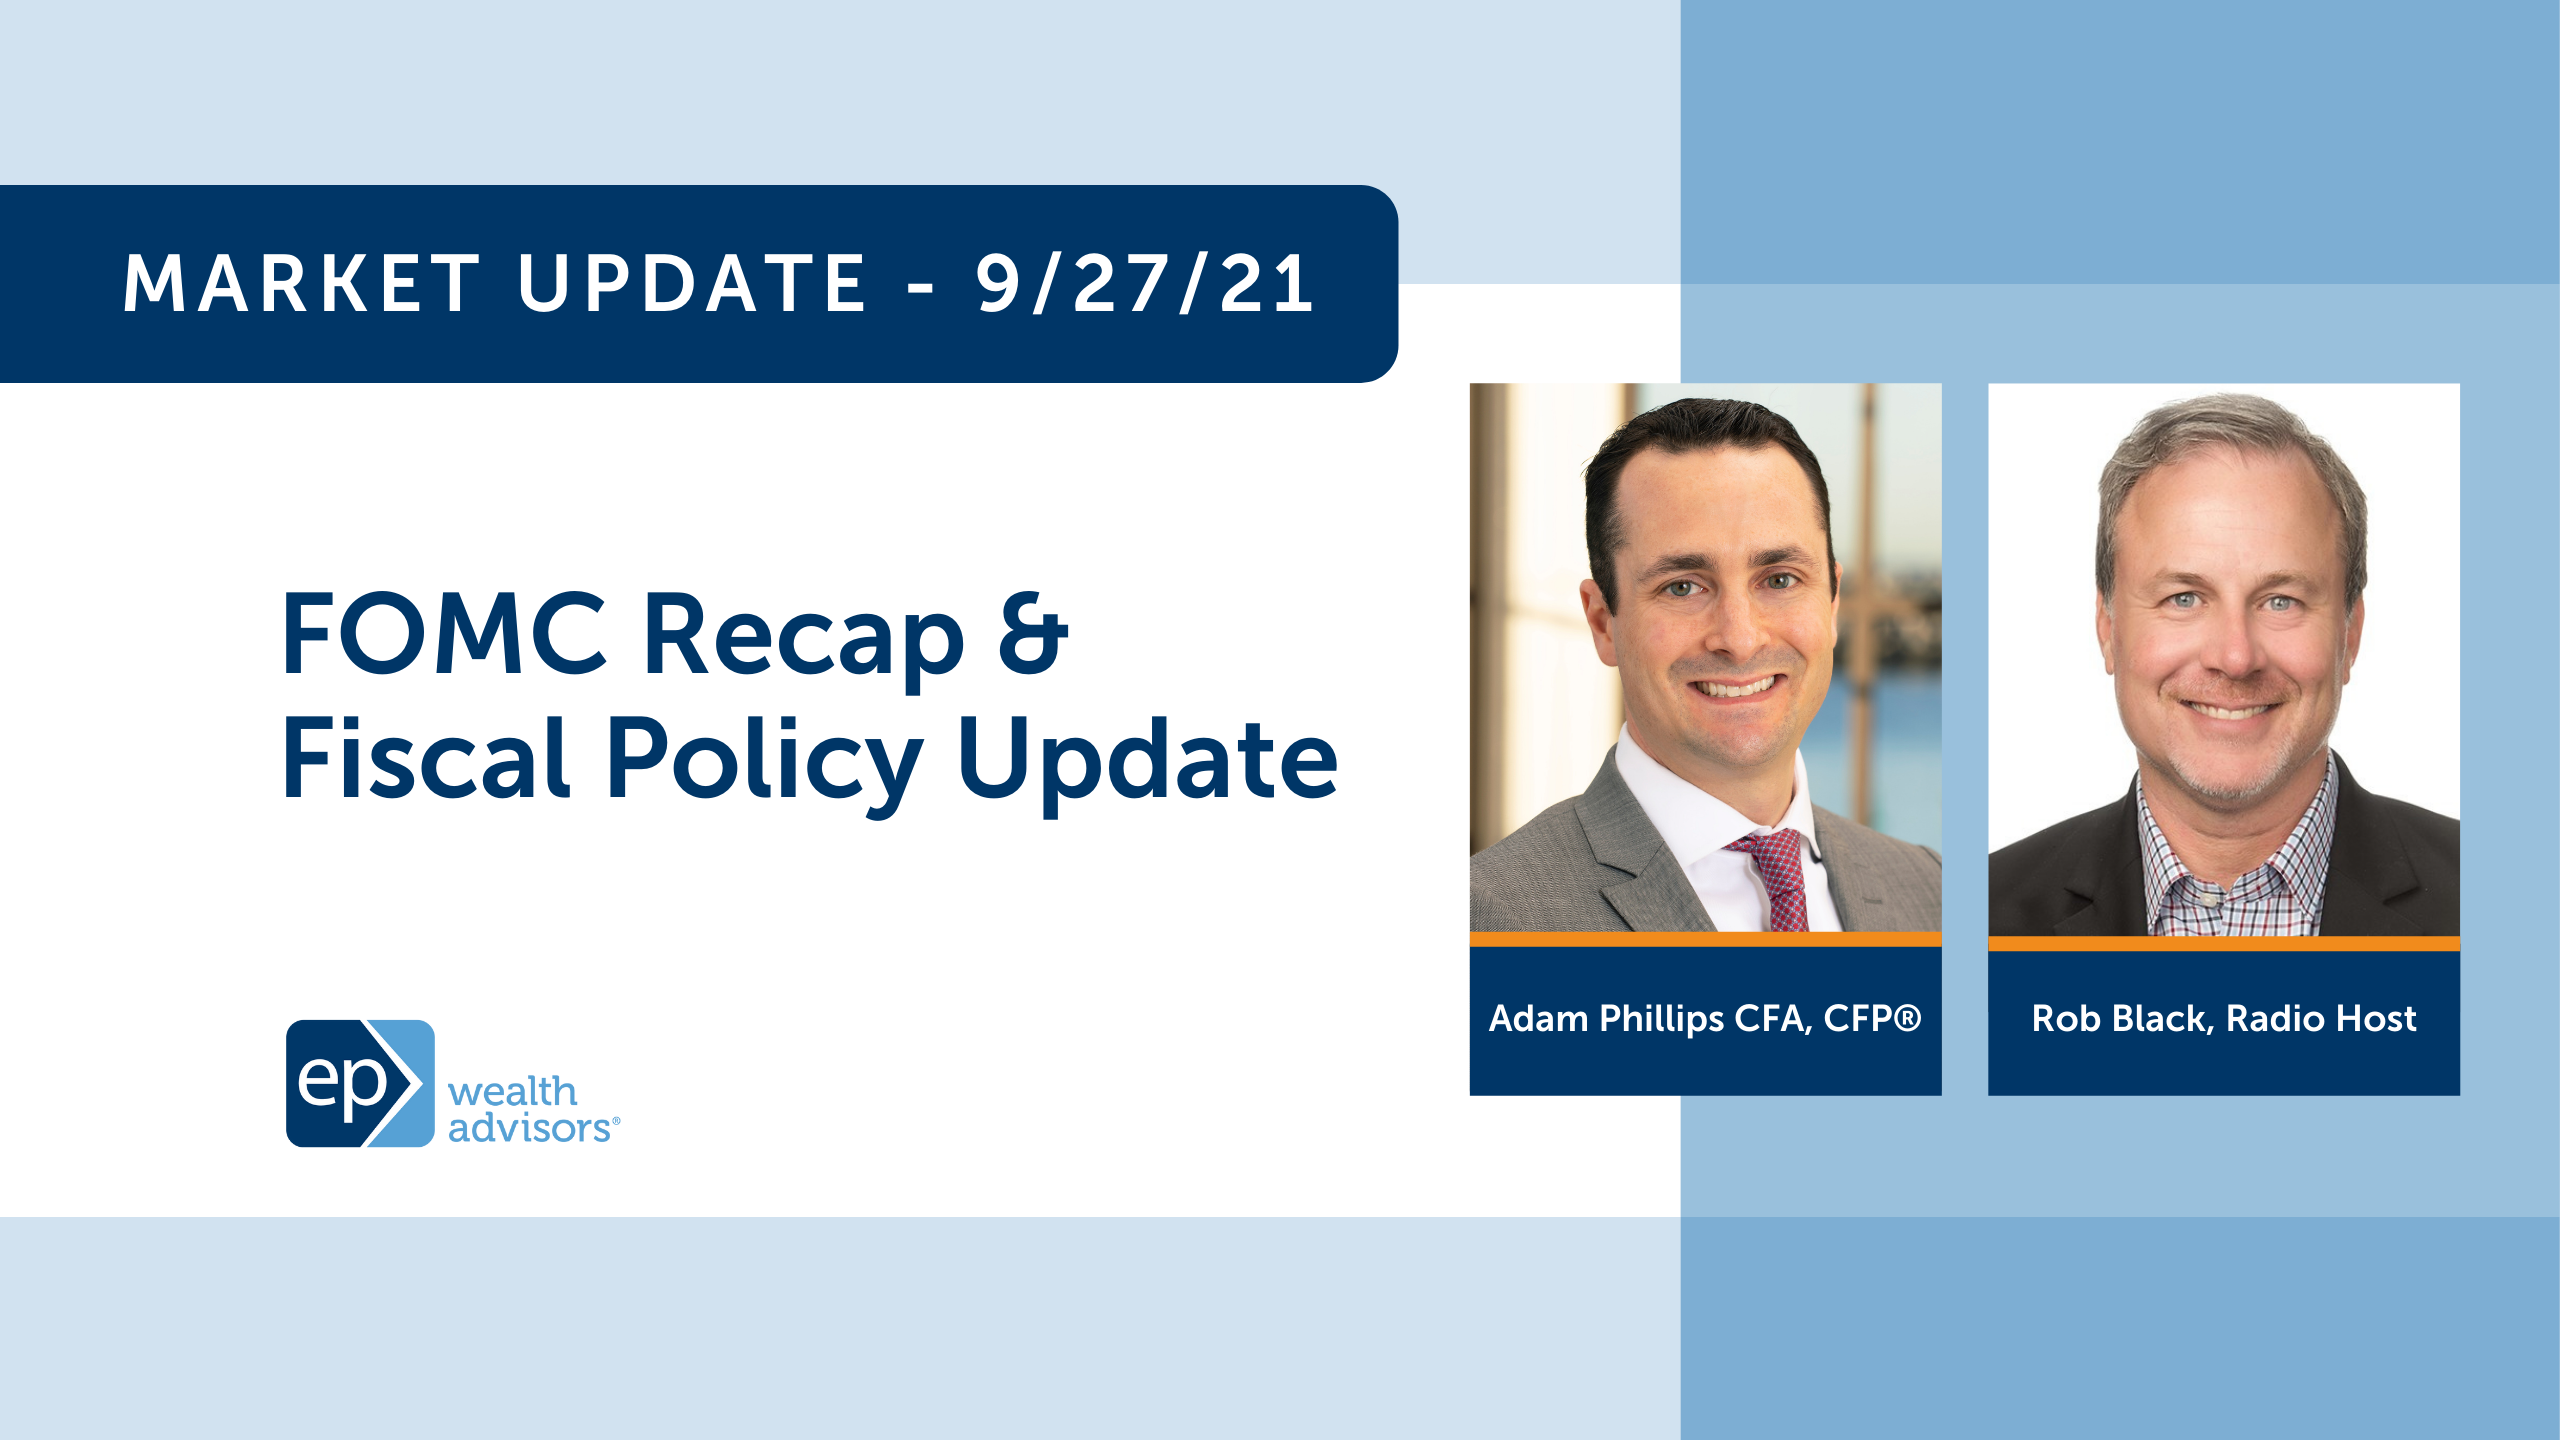 FOMC Recap & Fiscal Policy Update | Market Update 9/27/21